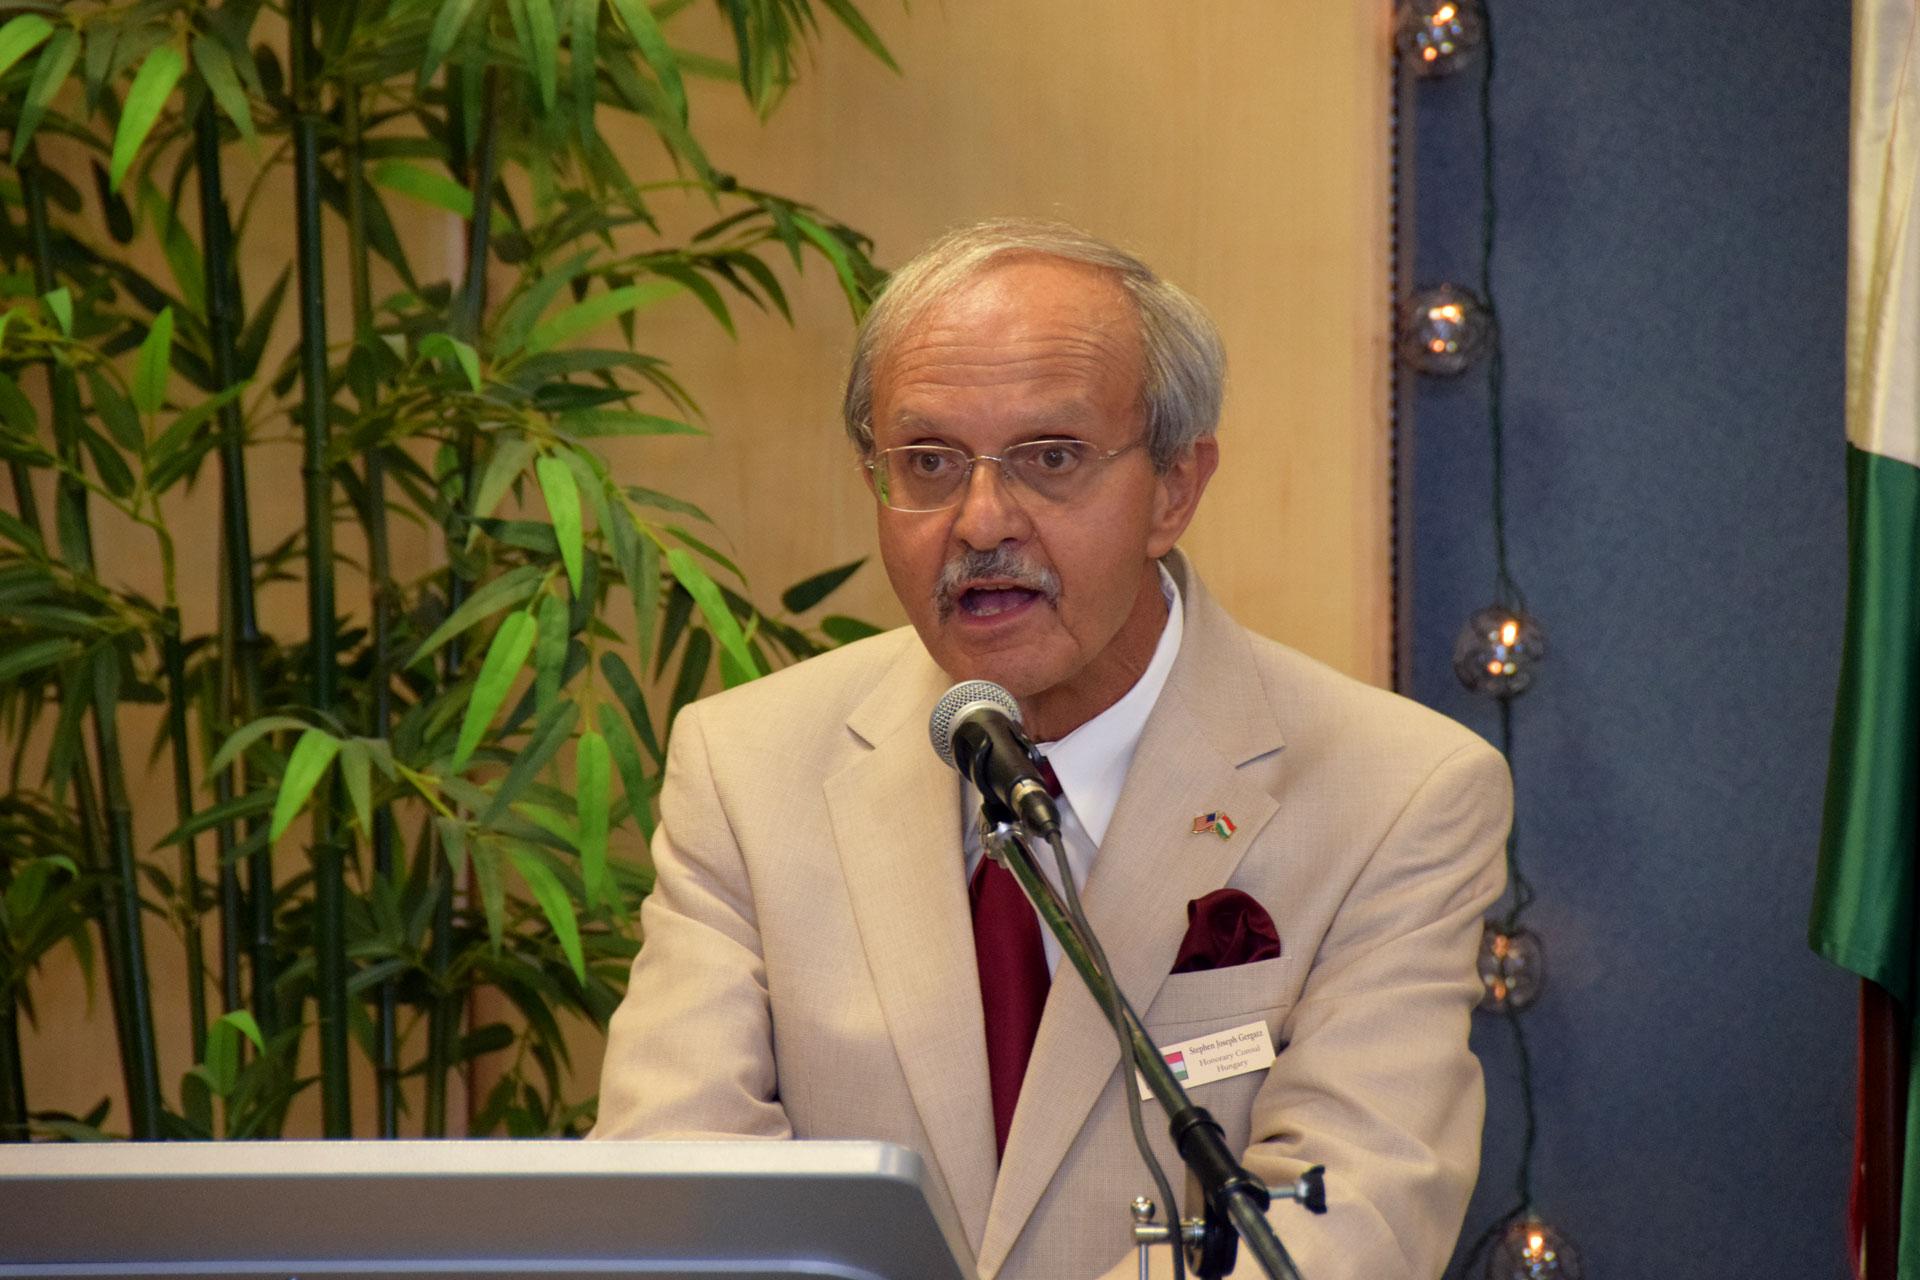 Mr. Stephen Joseph Gergatz, Honorary Consul of Sarasota, FL